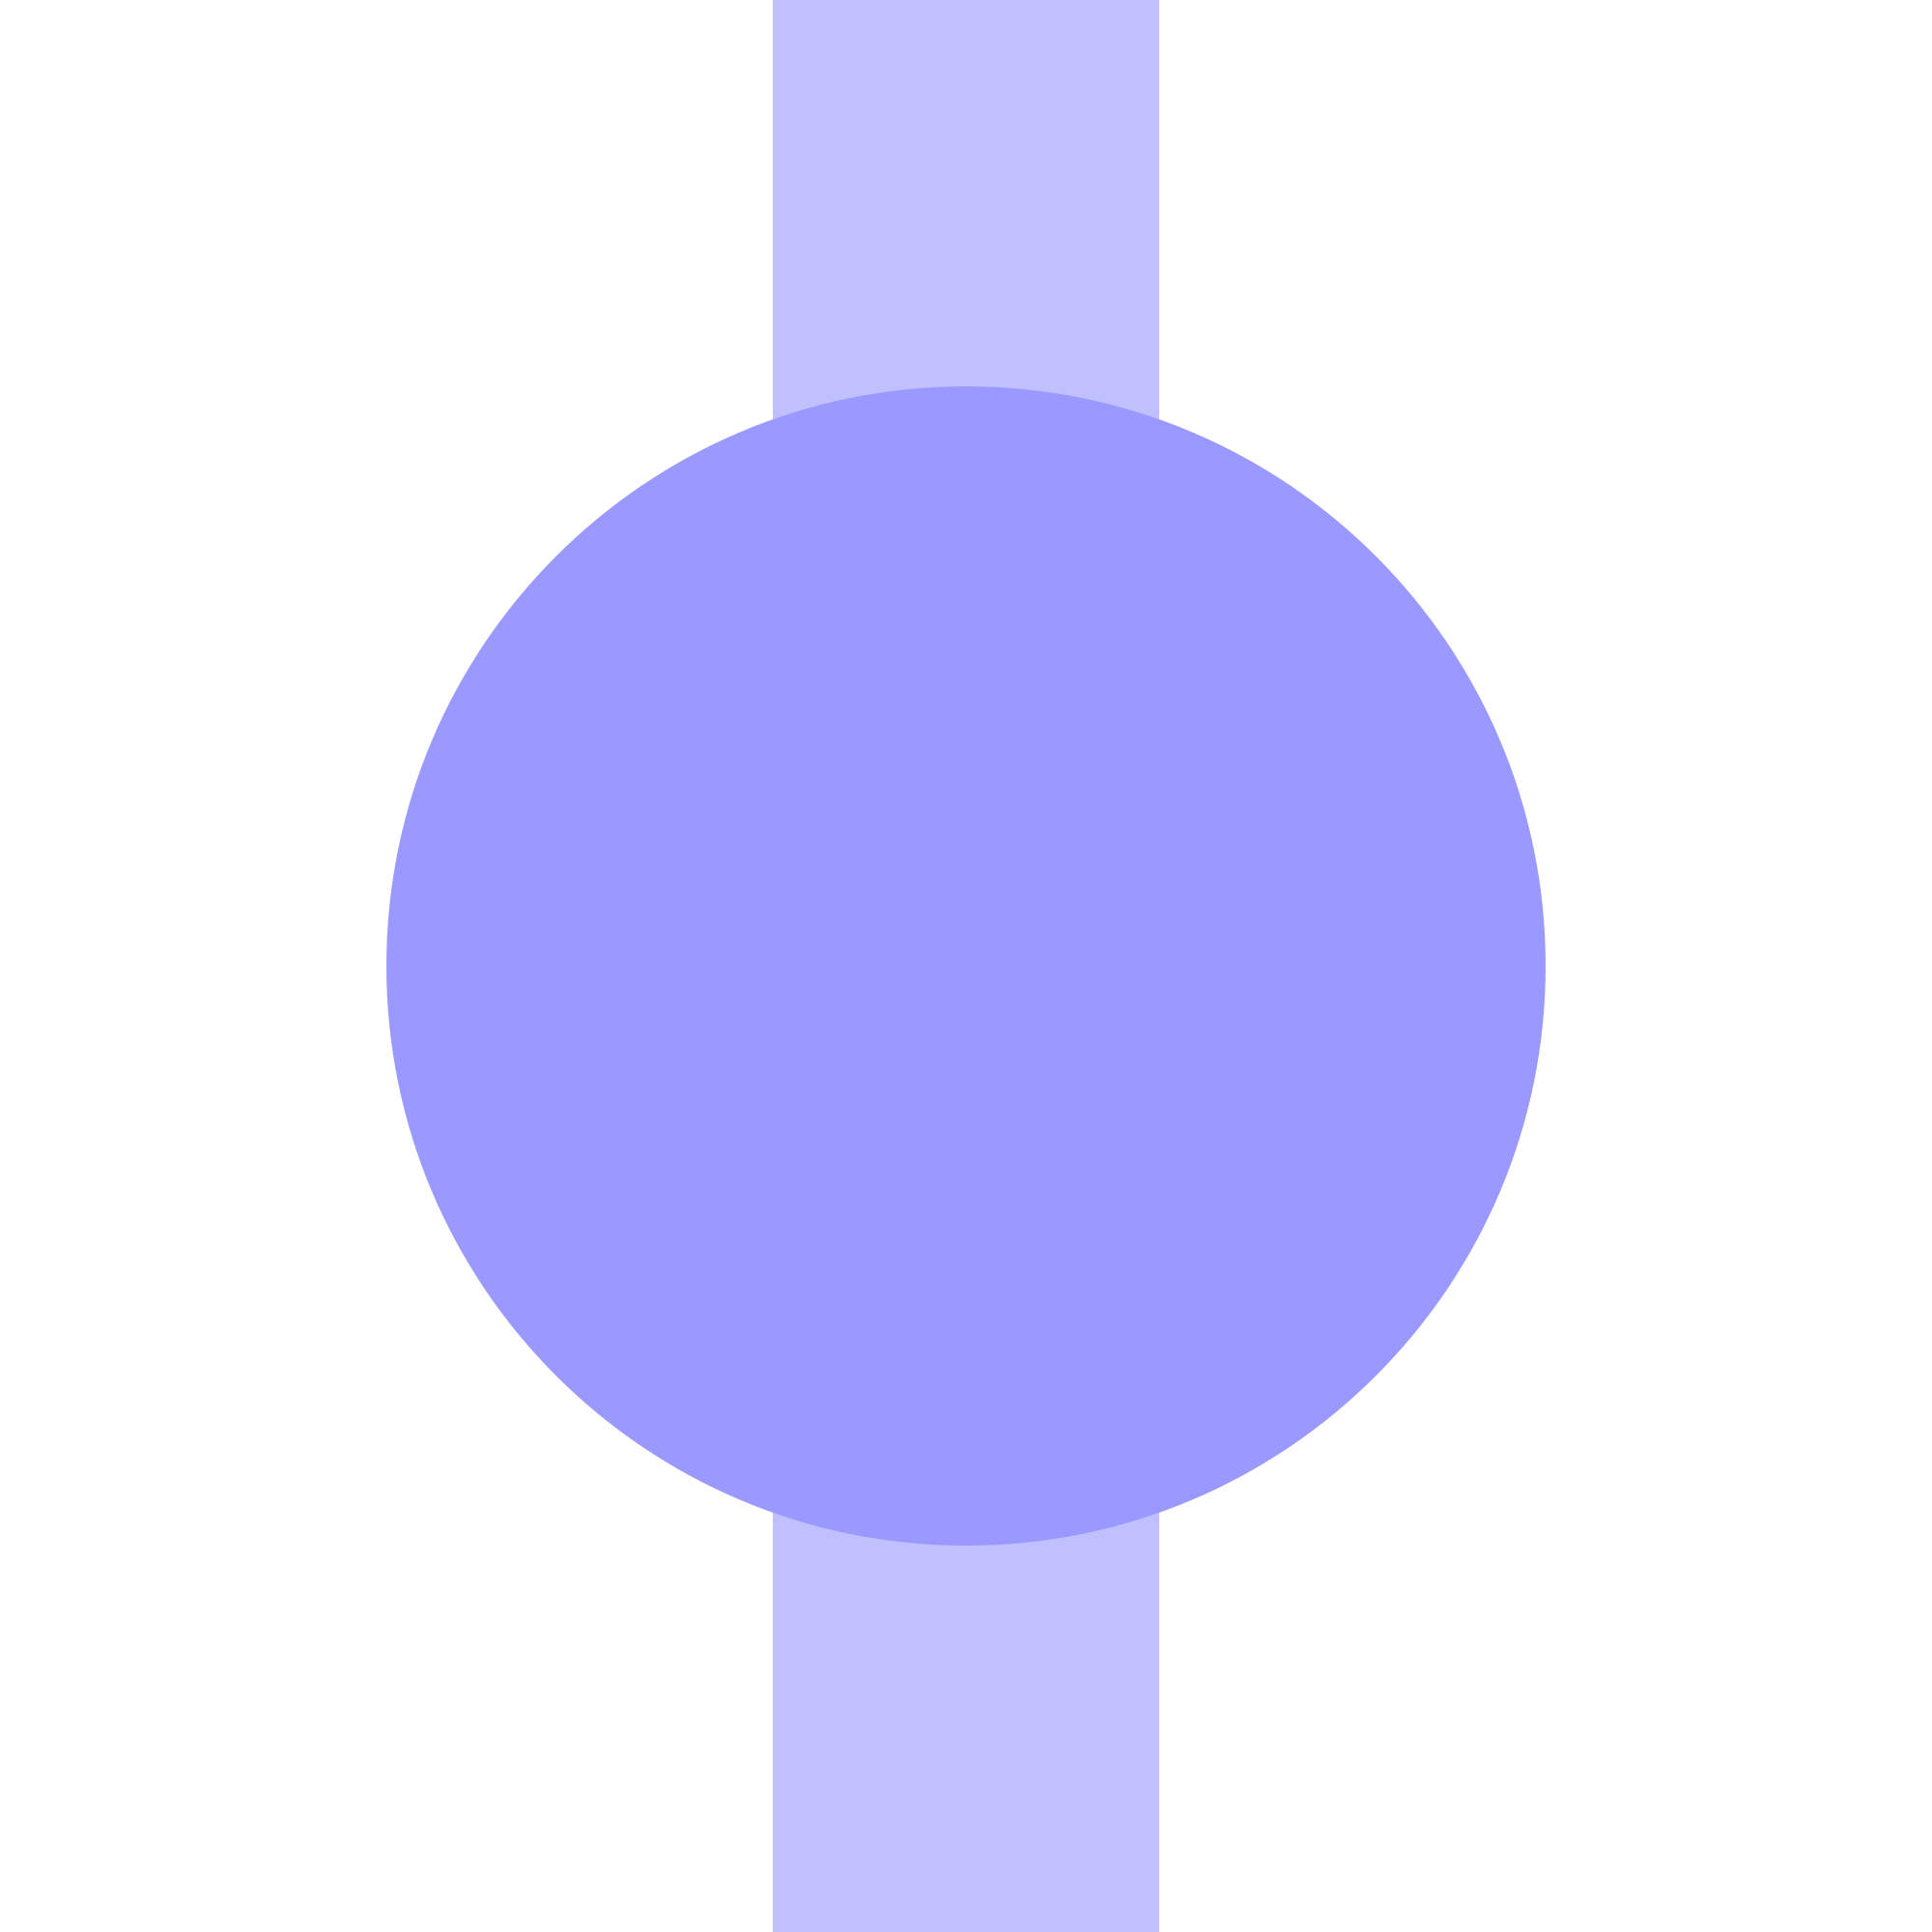 File bsicon xbhf wikimedia. Lavender clipart svg